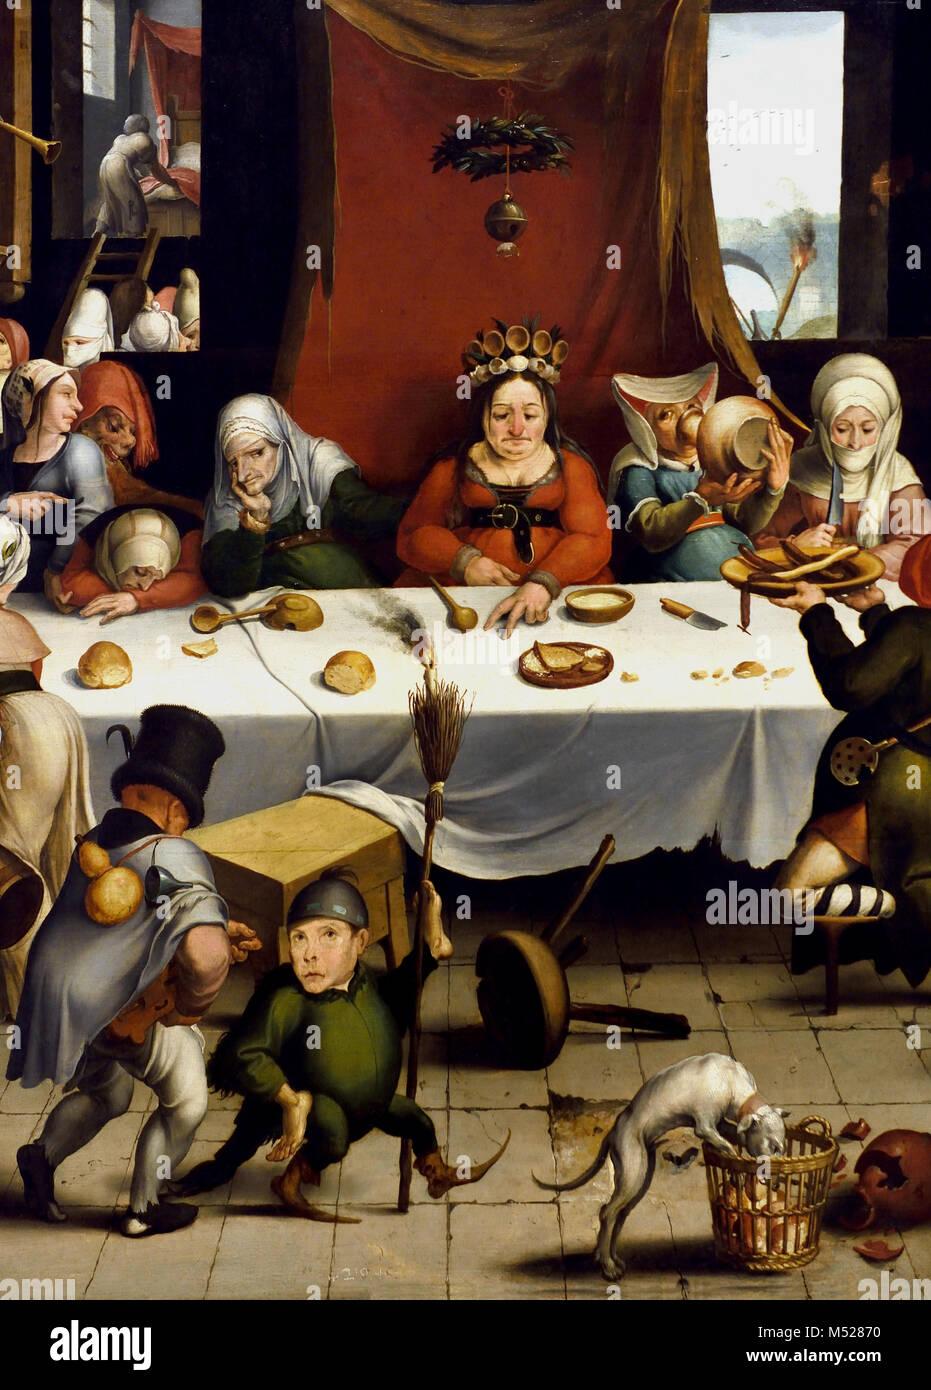 Burlesque Feast 1550 by Jan Mandijn (or Mandy) .1550, 16th, century, Belgian, Belgium, Flemish, (detail) - Stock Image